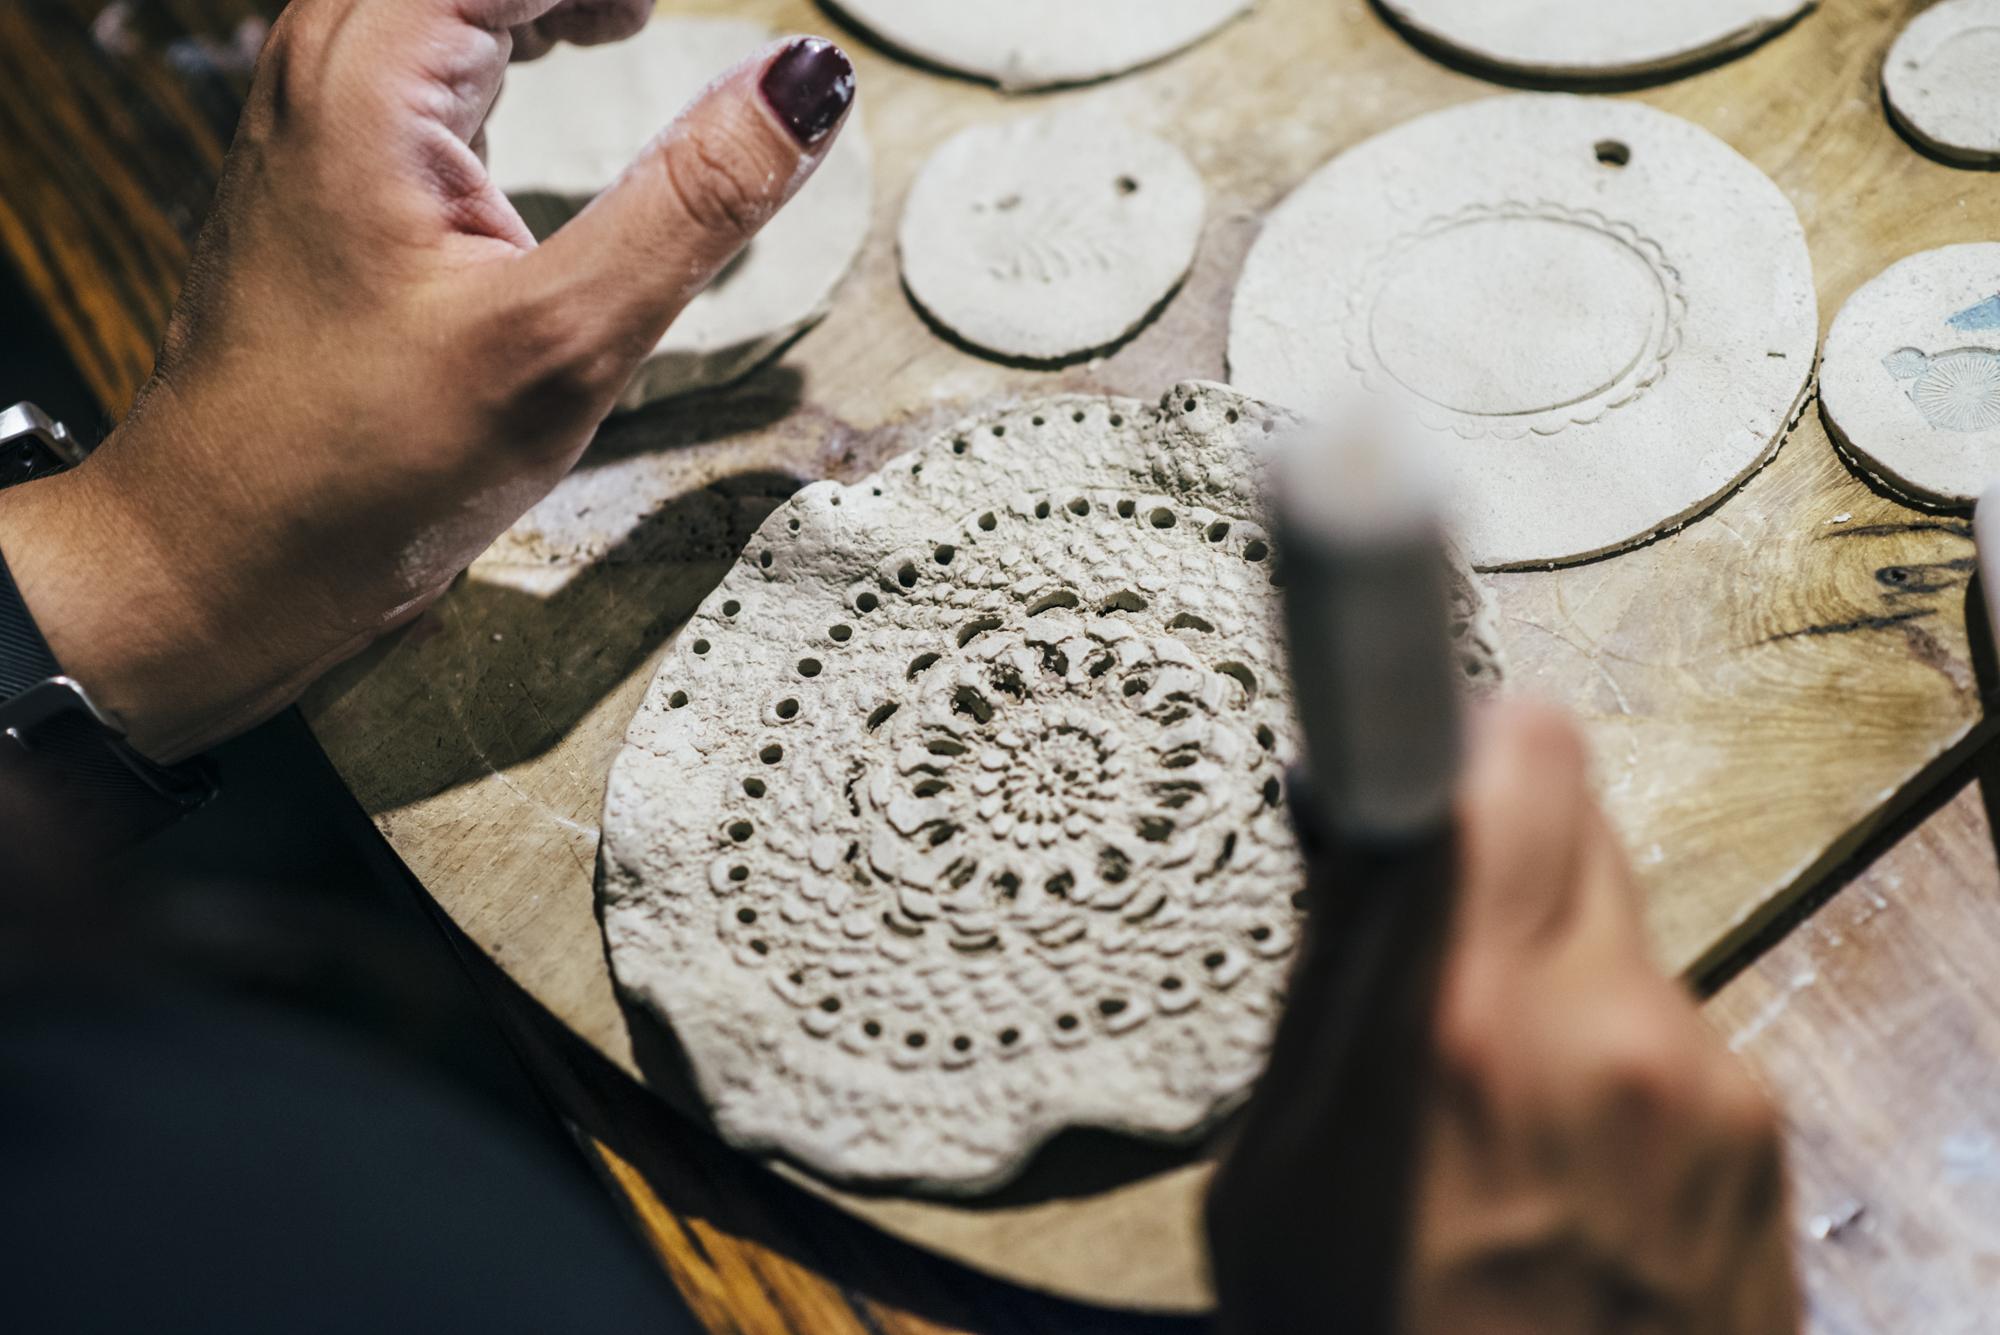 Ceramics - PYHII_4.JPG